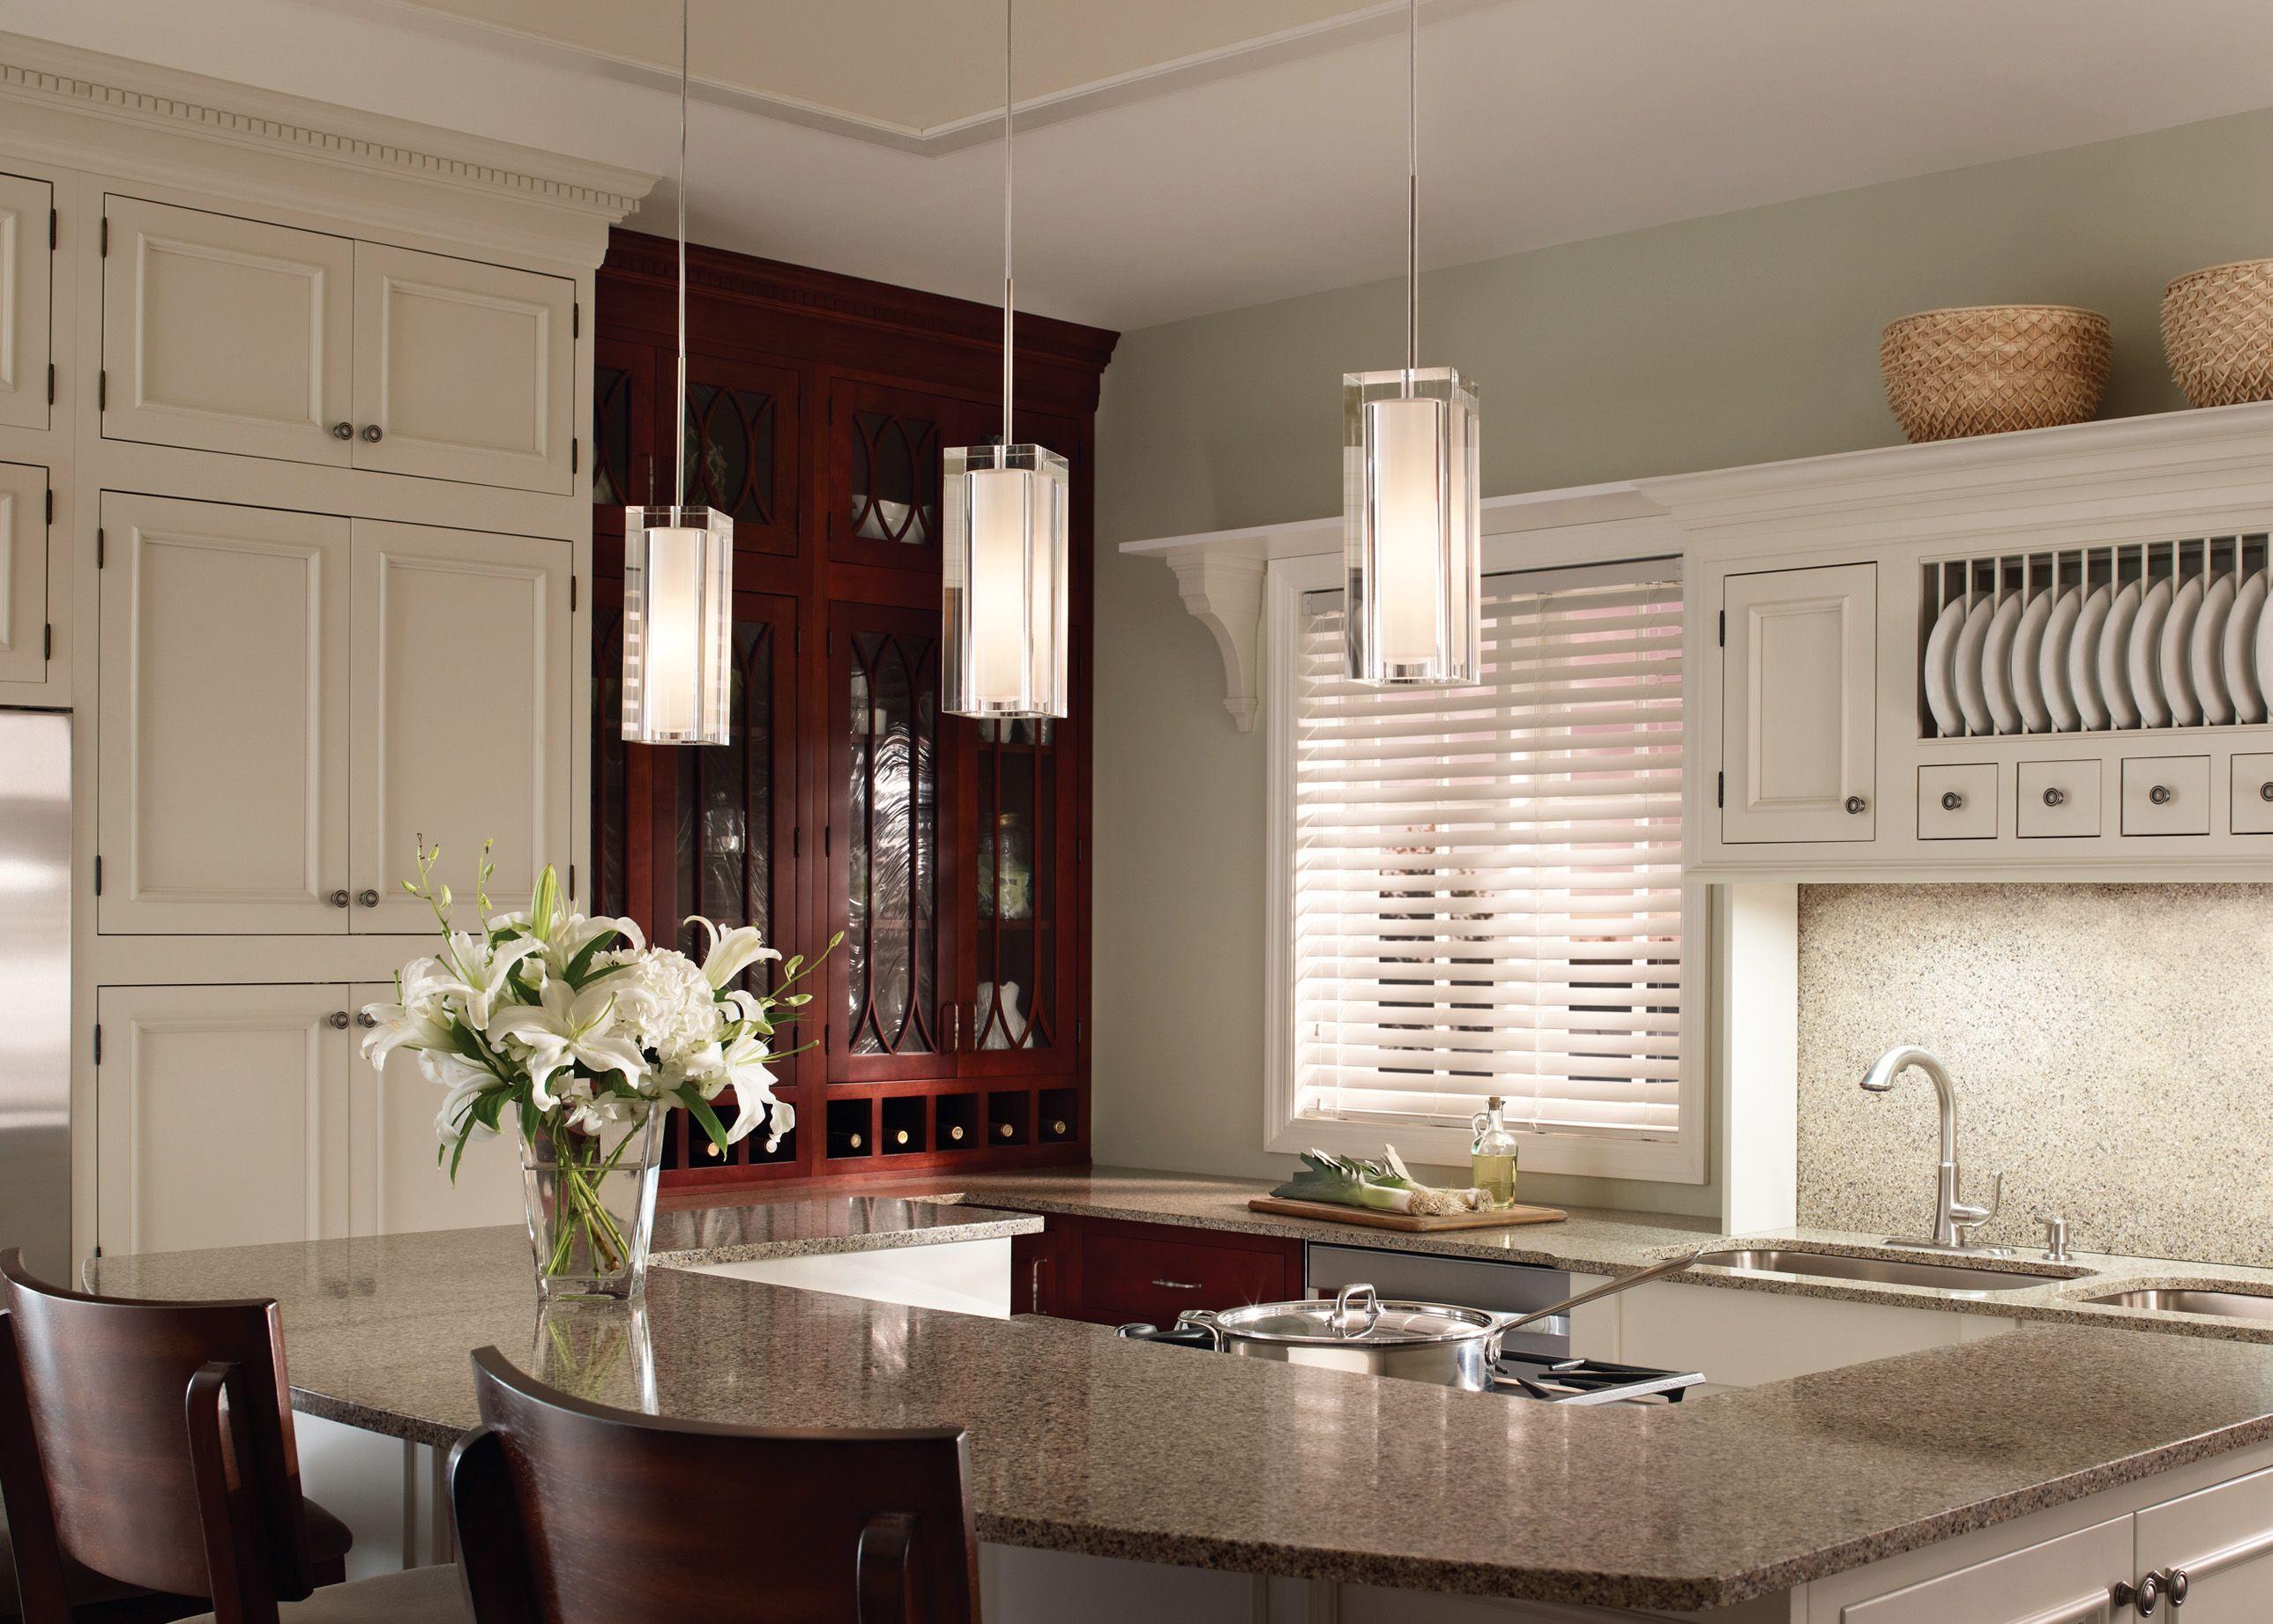 Pendant Lighting Ideas Kitchen pendant lighting, Pendant